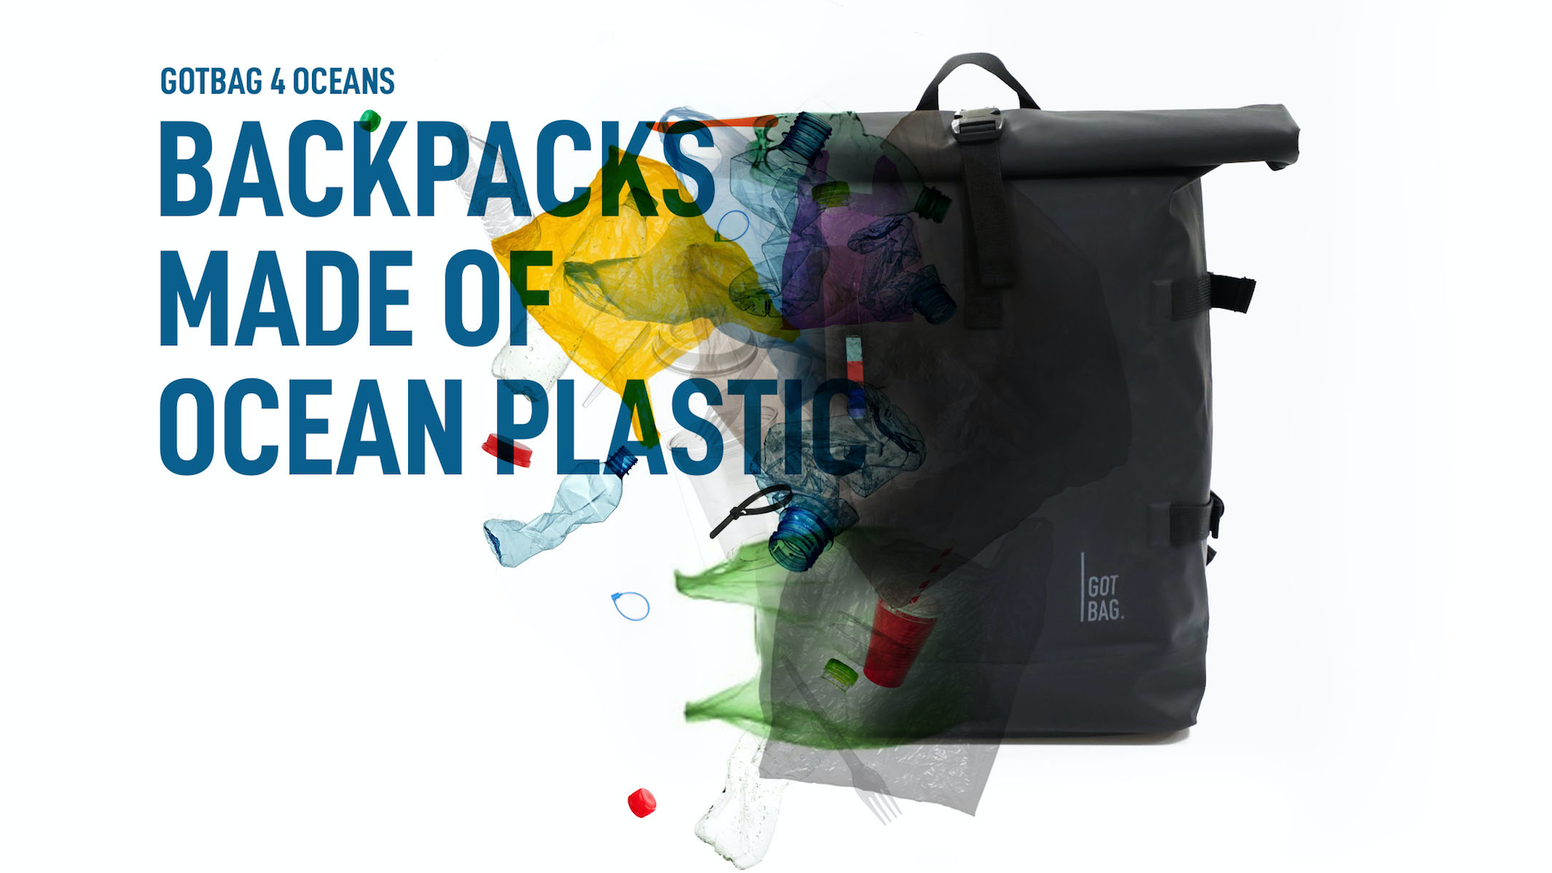 f63a81cf81d8 GOT BAG 4 Oceans - Backpacks made of ocean plastic by GOT BAG ...